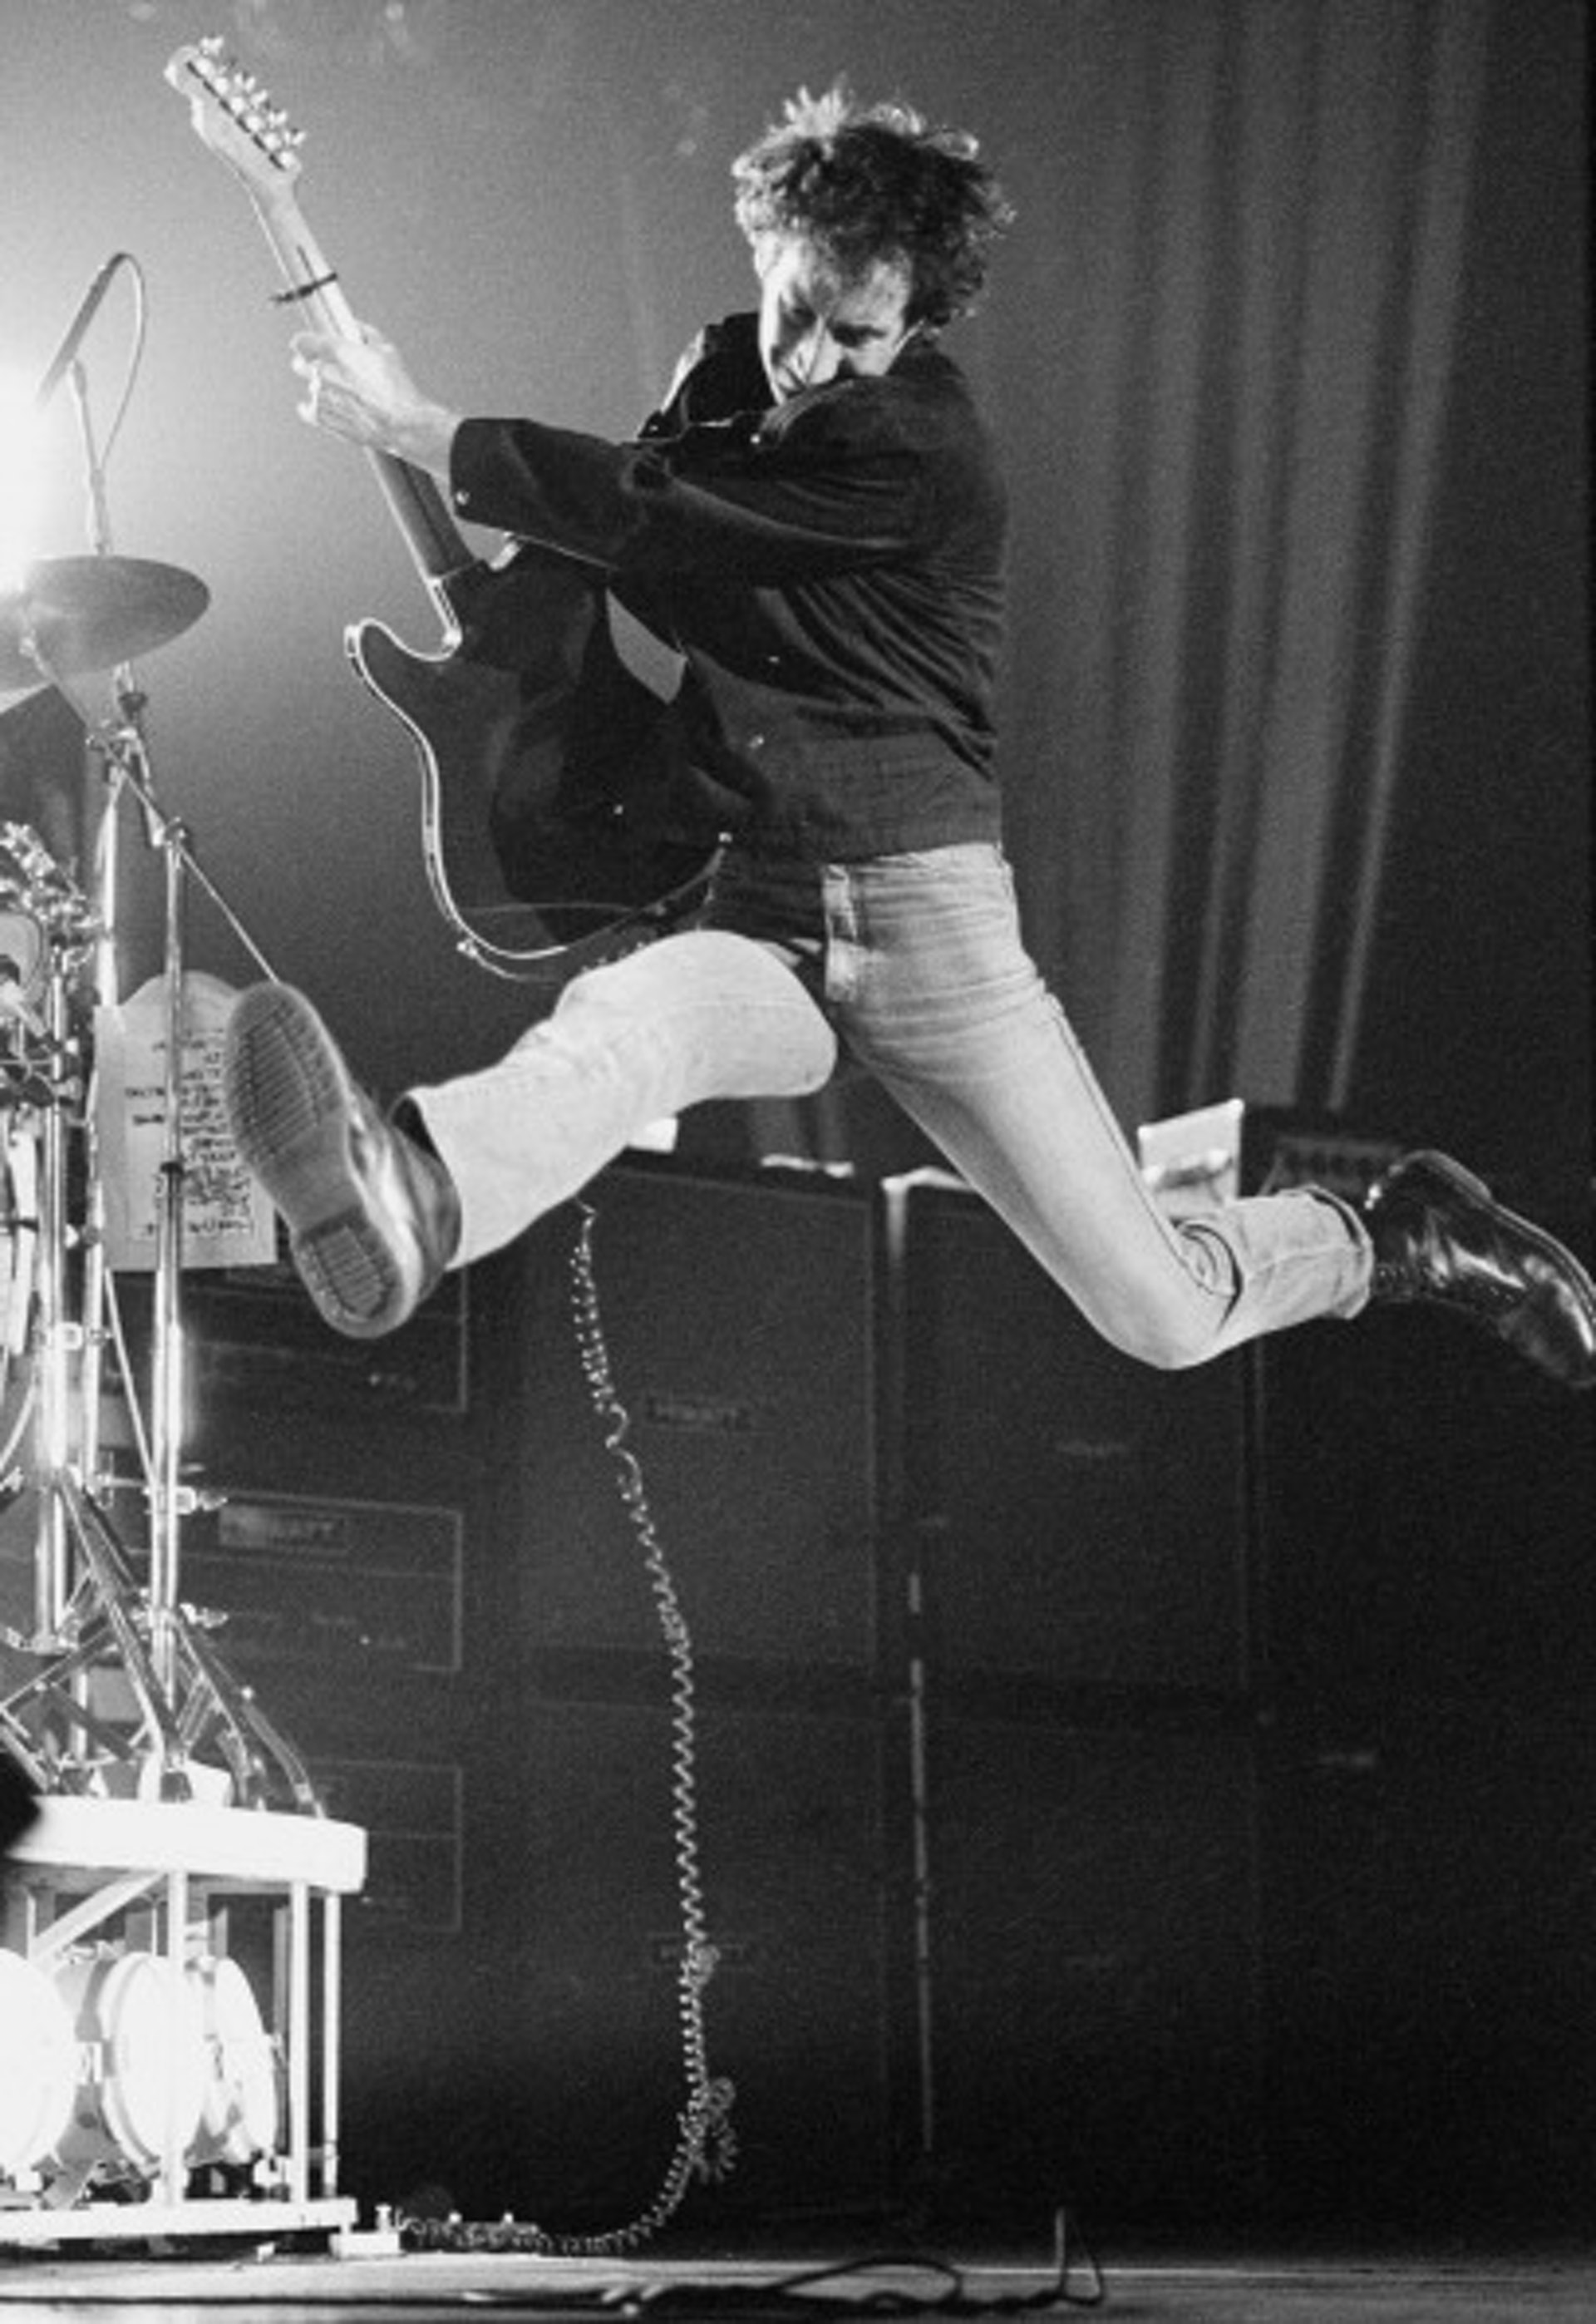 Pete Townshend (The Rock) mang Dr.Martens trên sân khấu